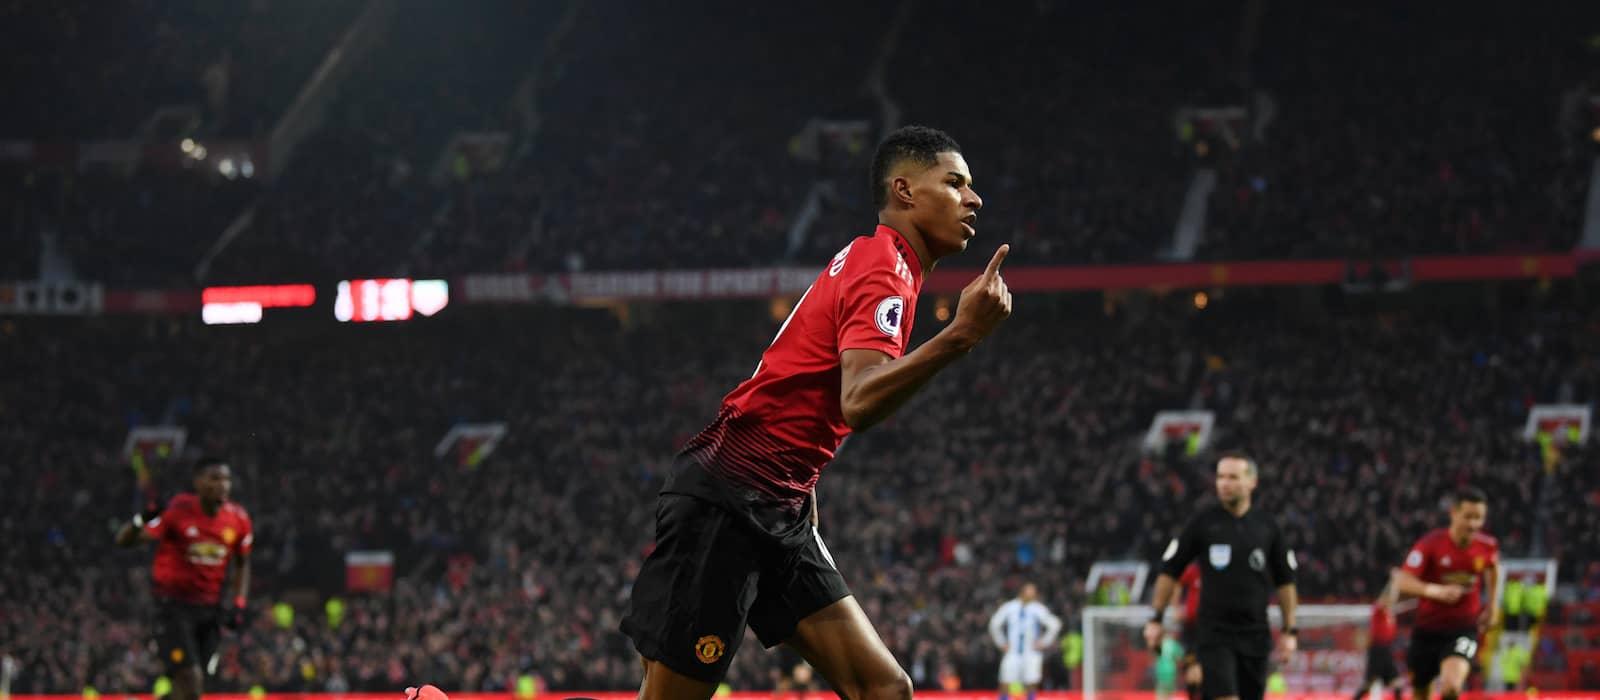 Manchester United fans ecstatic with Marcus Rashford's performance vs Brighton